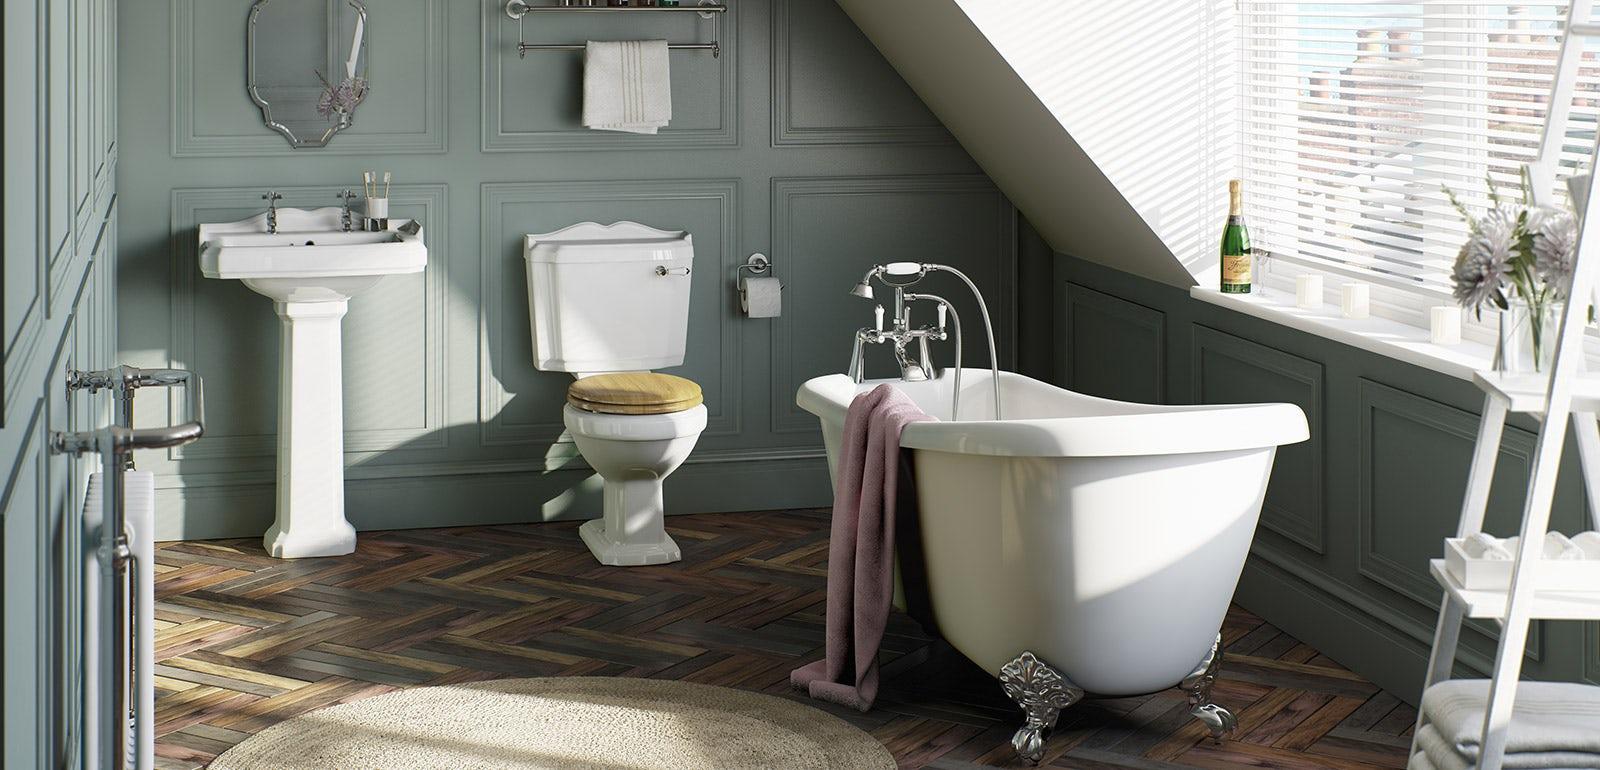 Plumbs bathroom suites - Plumbs Bathroom Suites Winchester Bathroom Suite Range